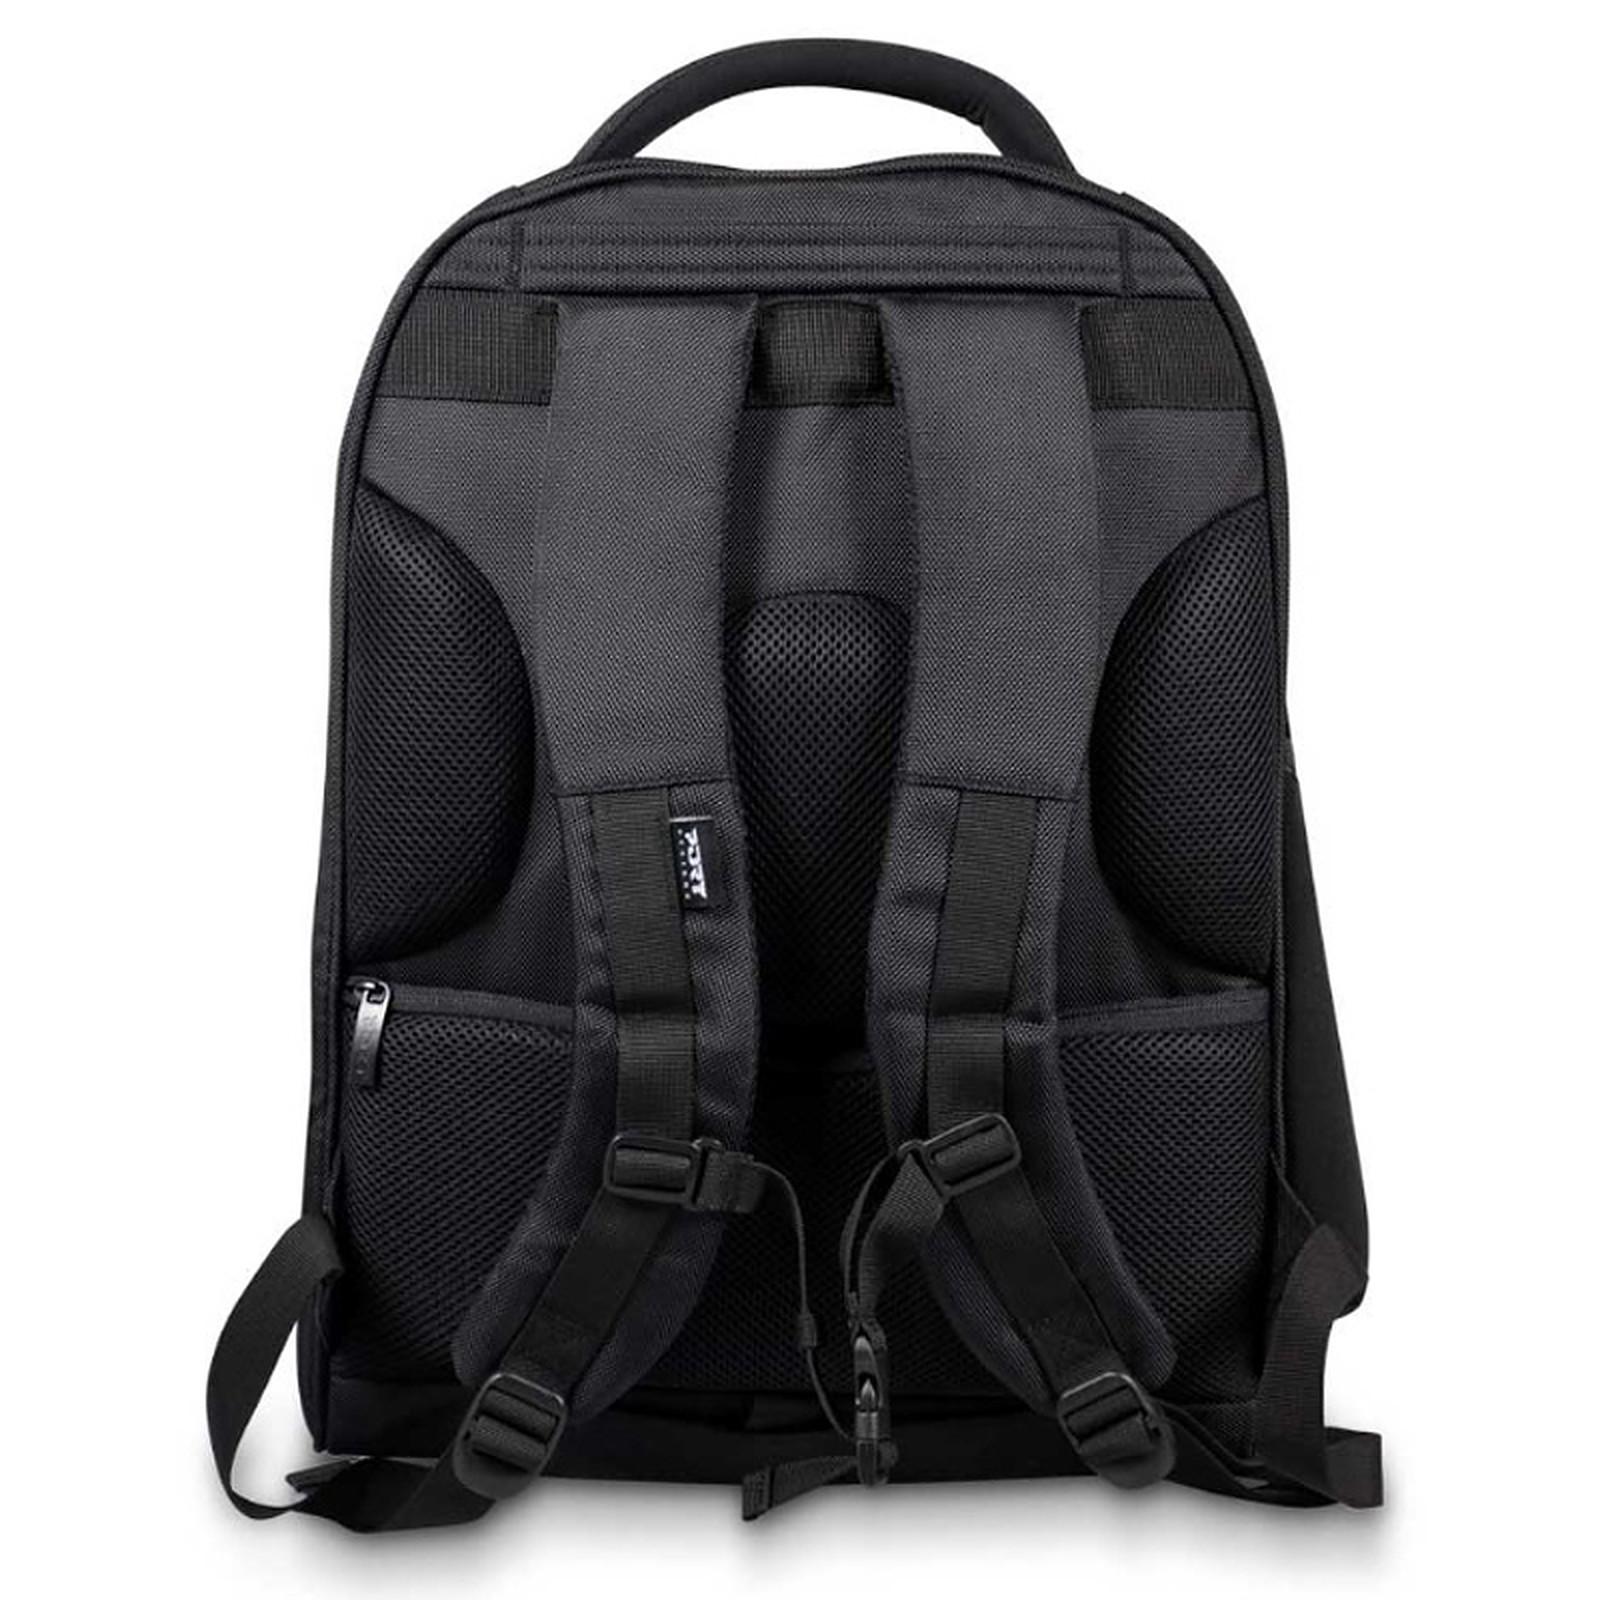 d8089ed136 PORT Designs Manhattan Backpack 17.3'' - Sac, sacoche, housse PORT ...